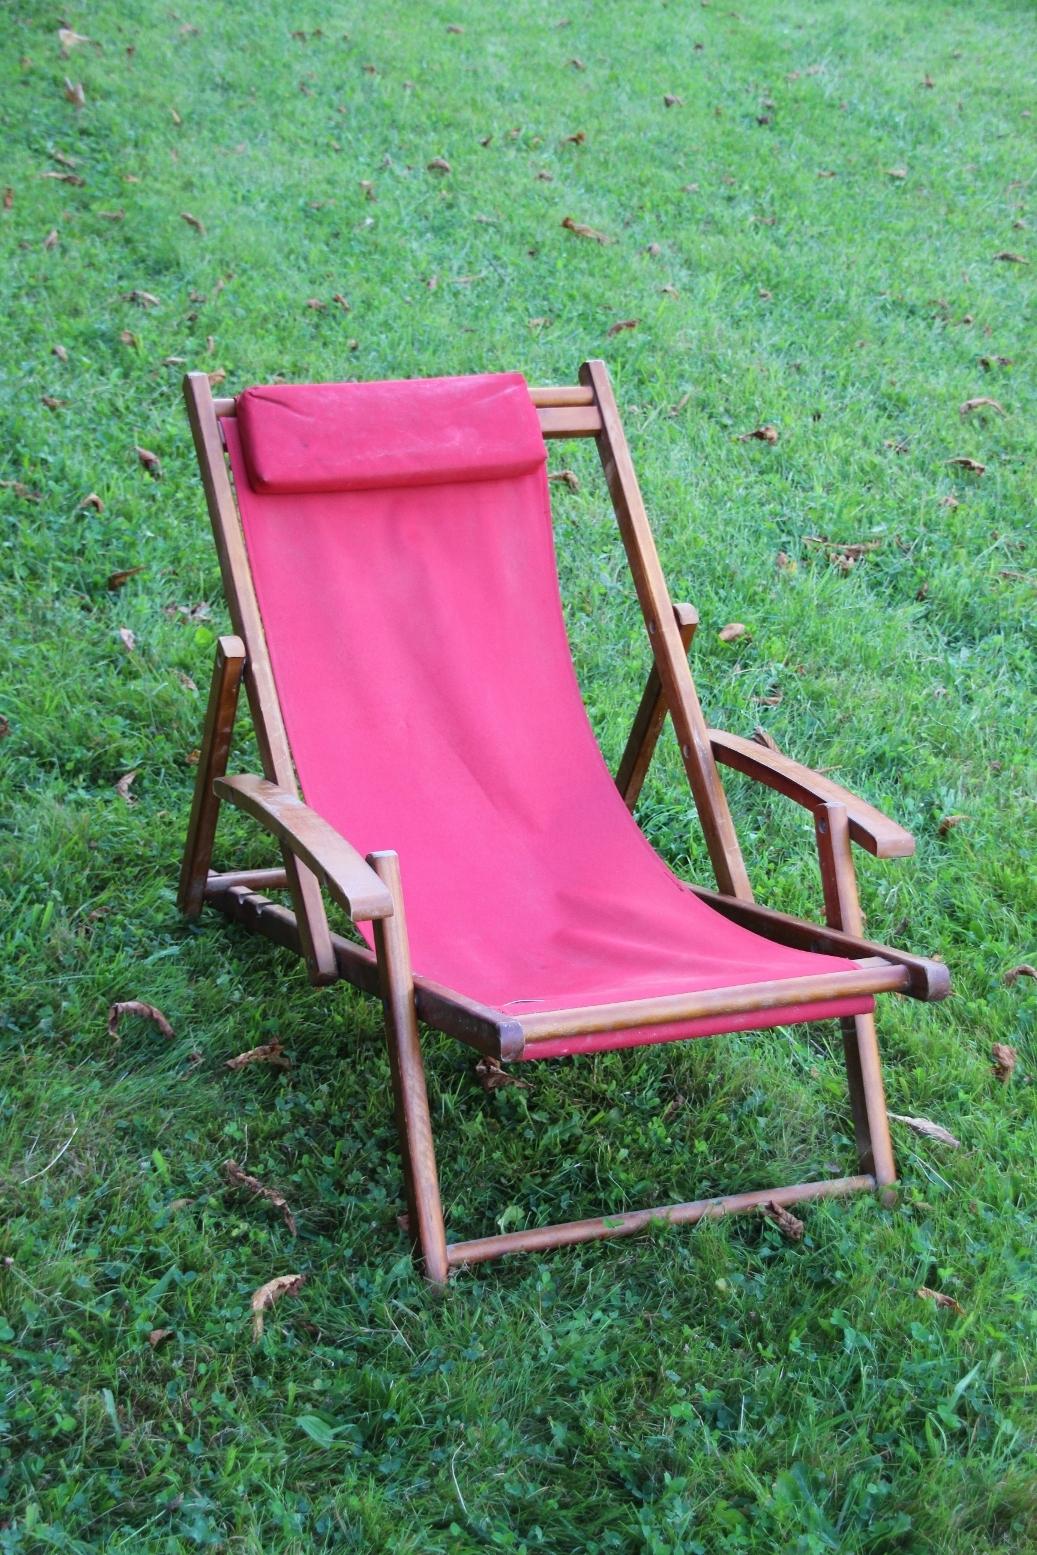 Bequemer living garden liegestuhl mit armlehnen camping garten balkon liege ebay - Liegestuhl camping ...